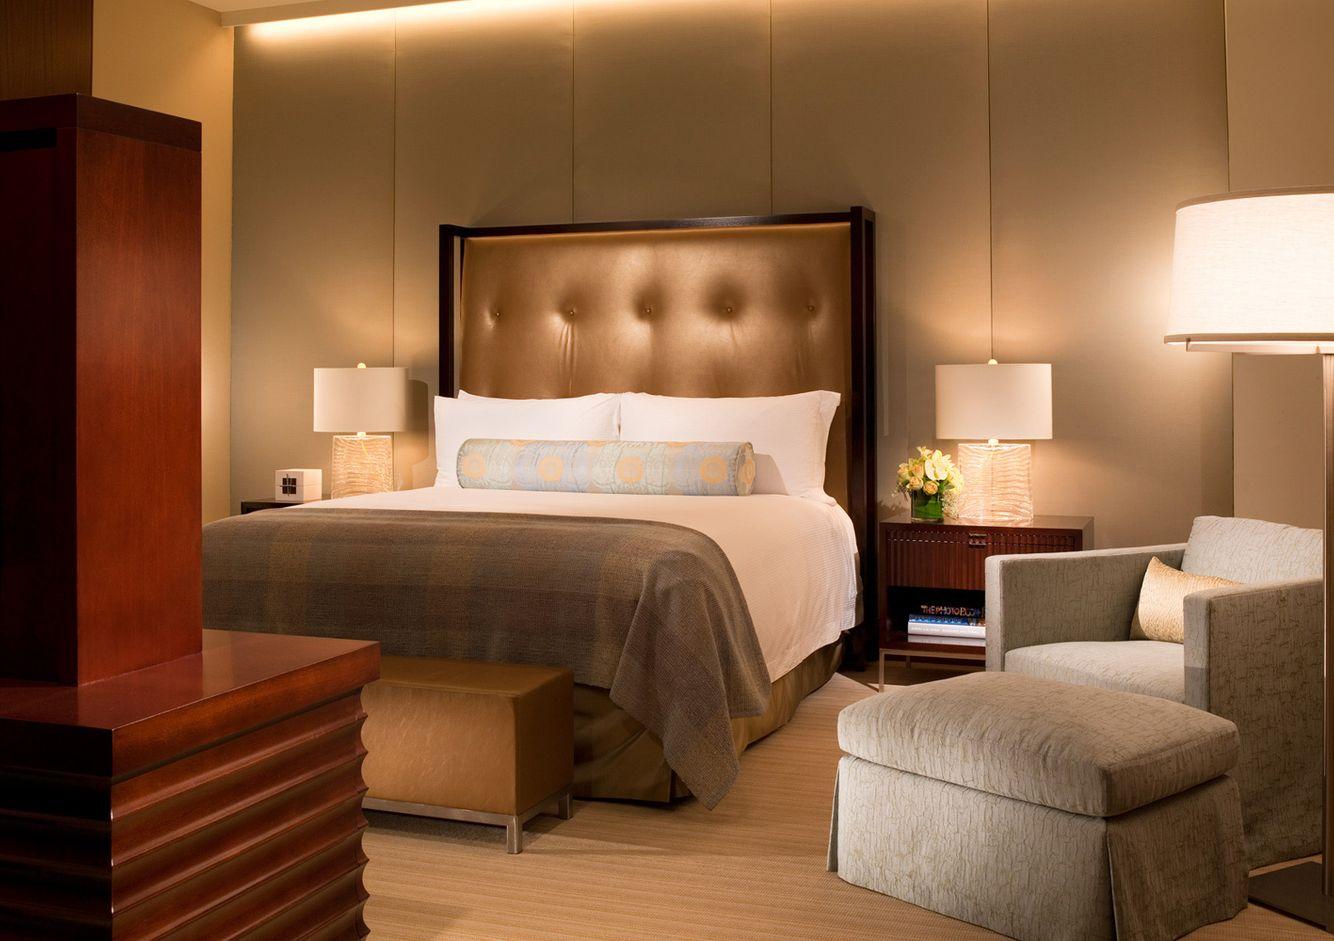 John-Sutton-Photography-Four Seasons Hotel, St. Louis Presidential Suite